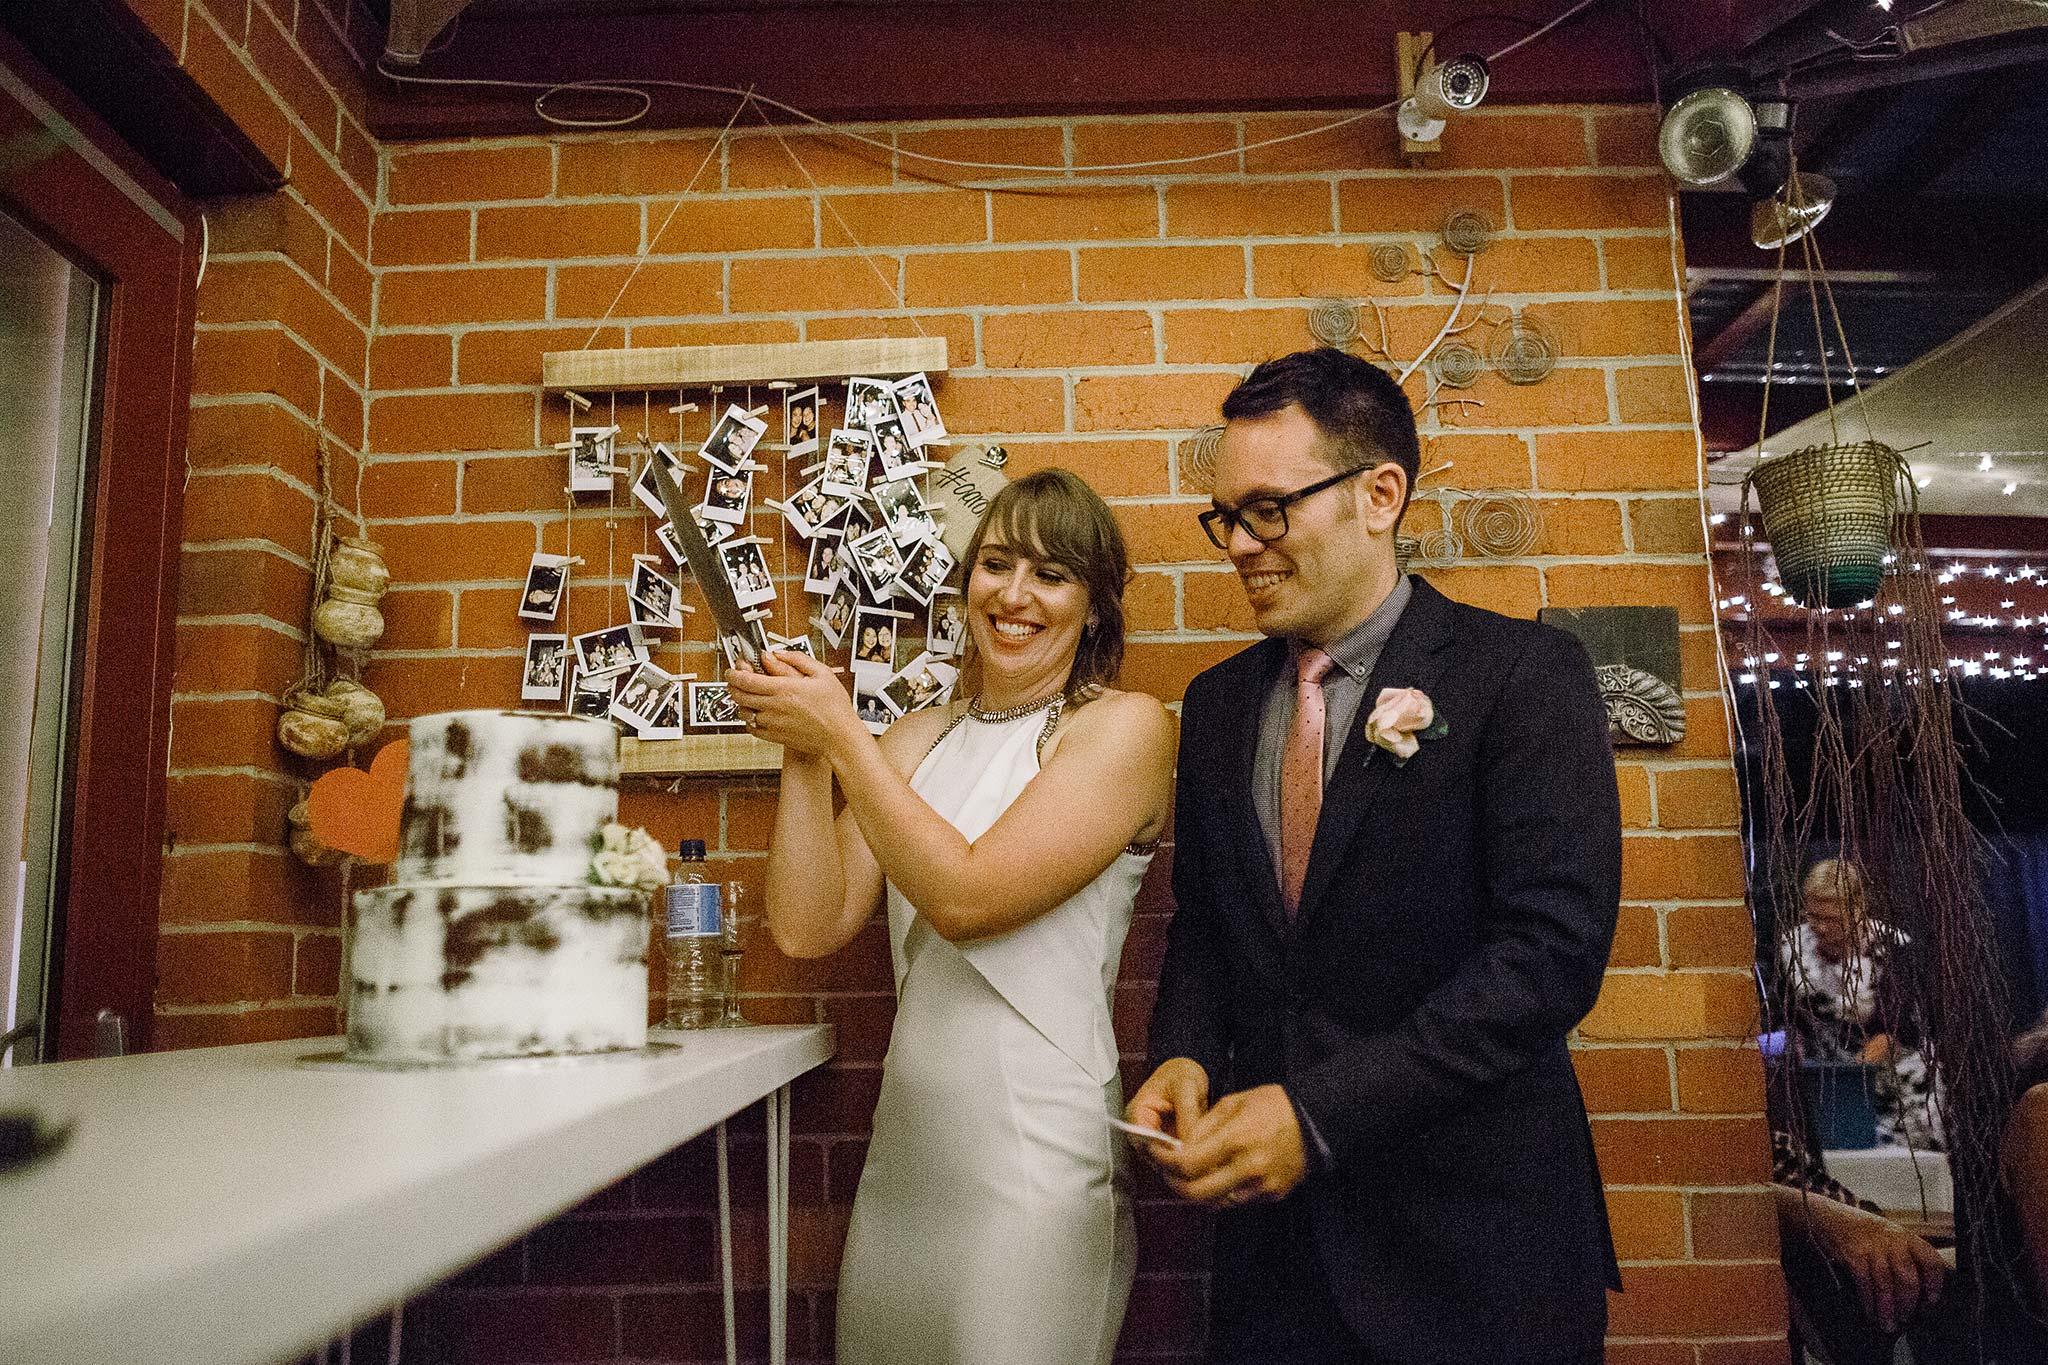 Strathmore-Melbourne-Backyard-Wedding-reception-cake-cutting